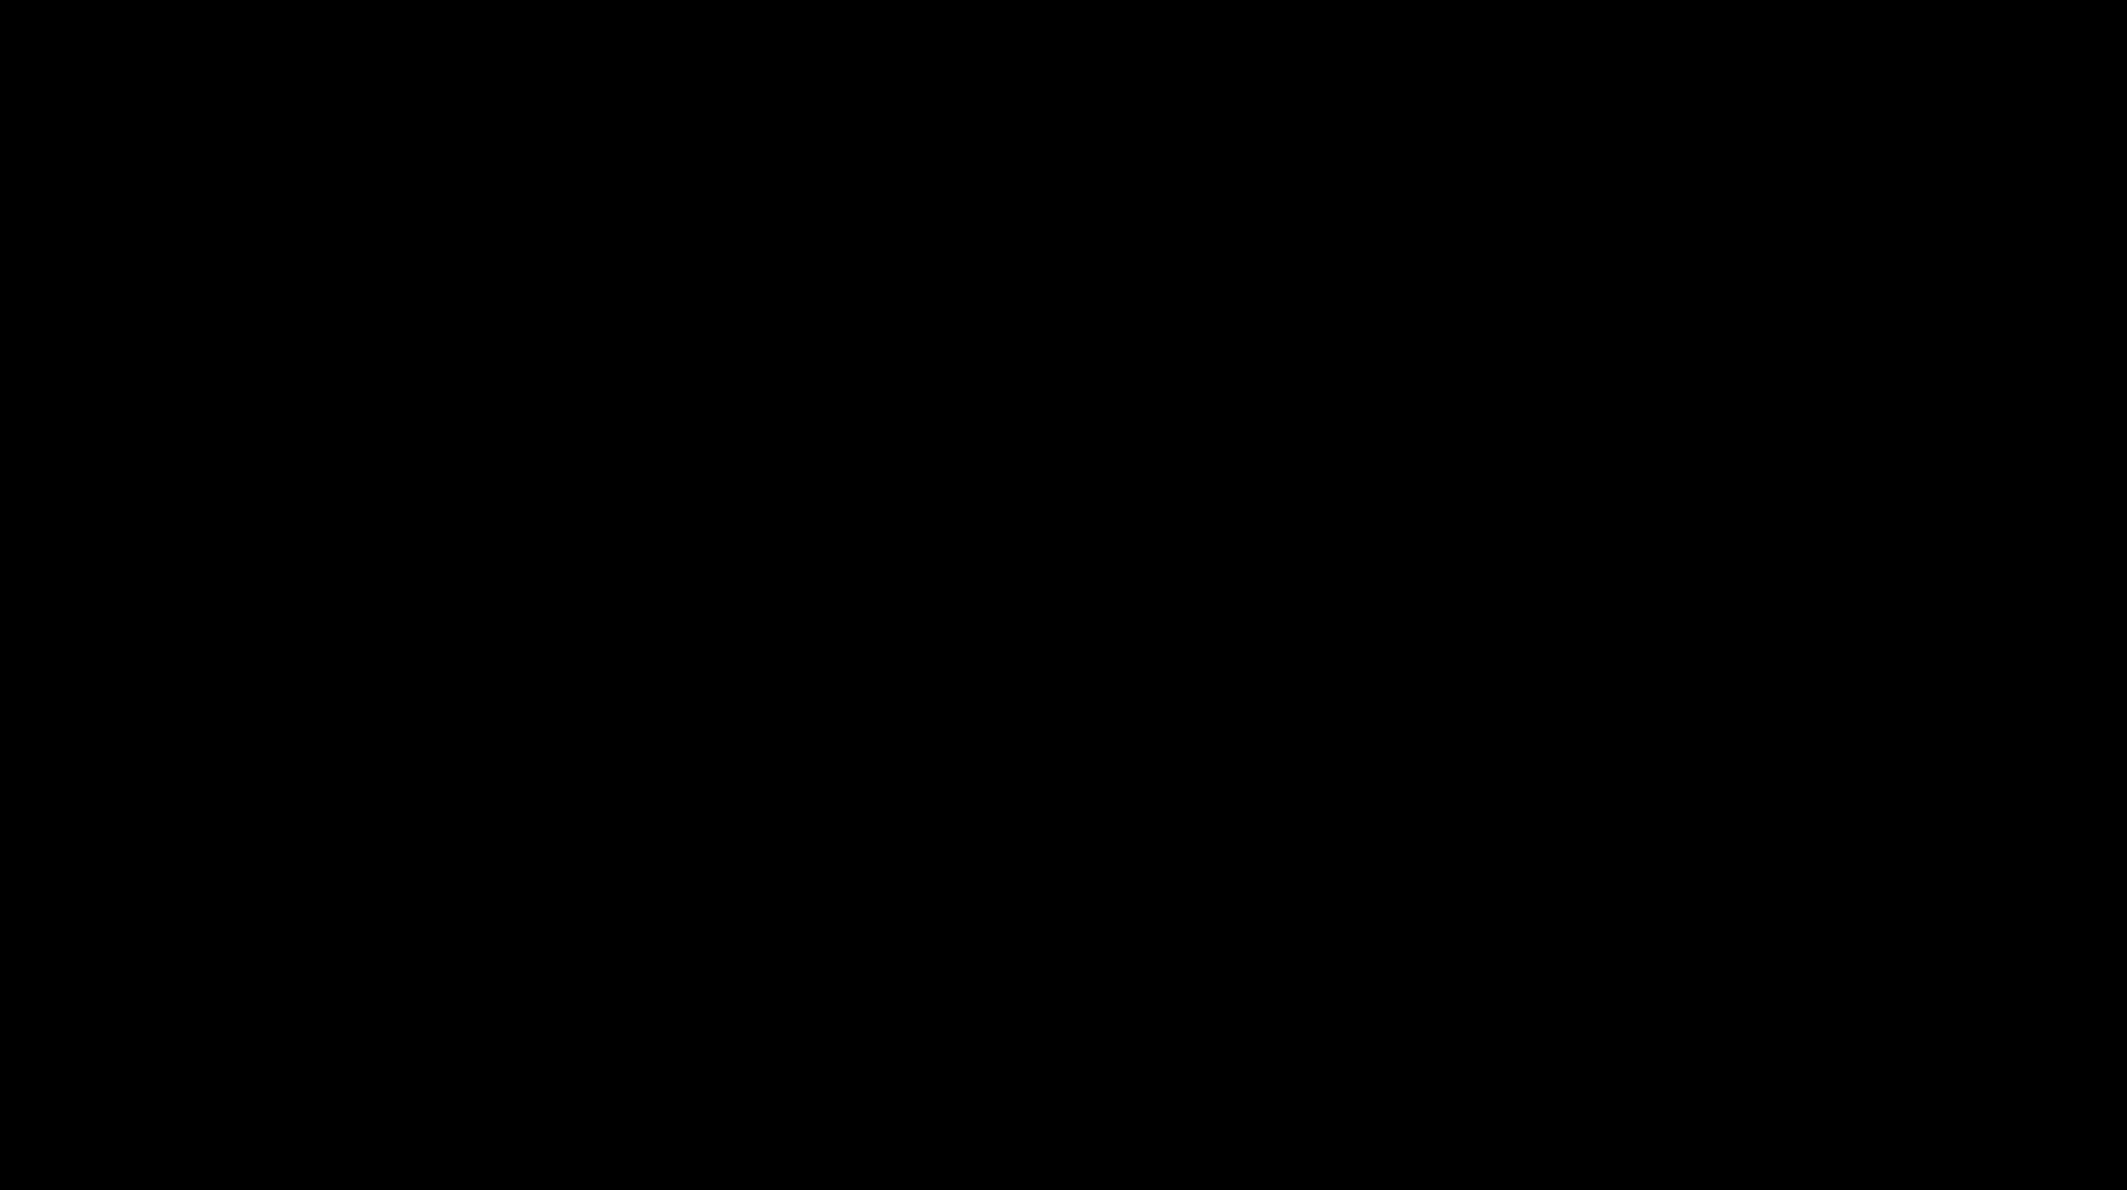 Blackfin BF772 ENDERBY